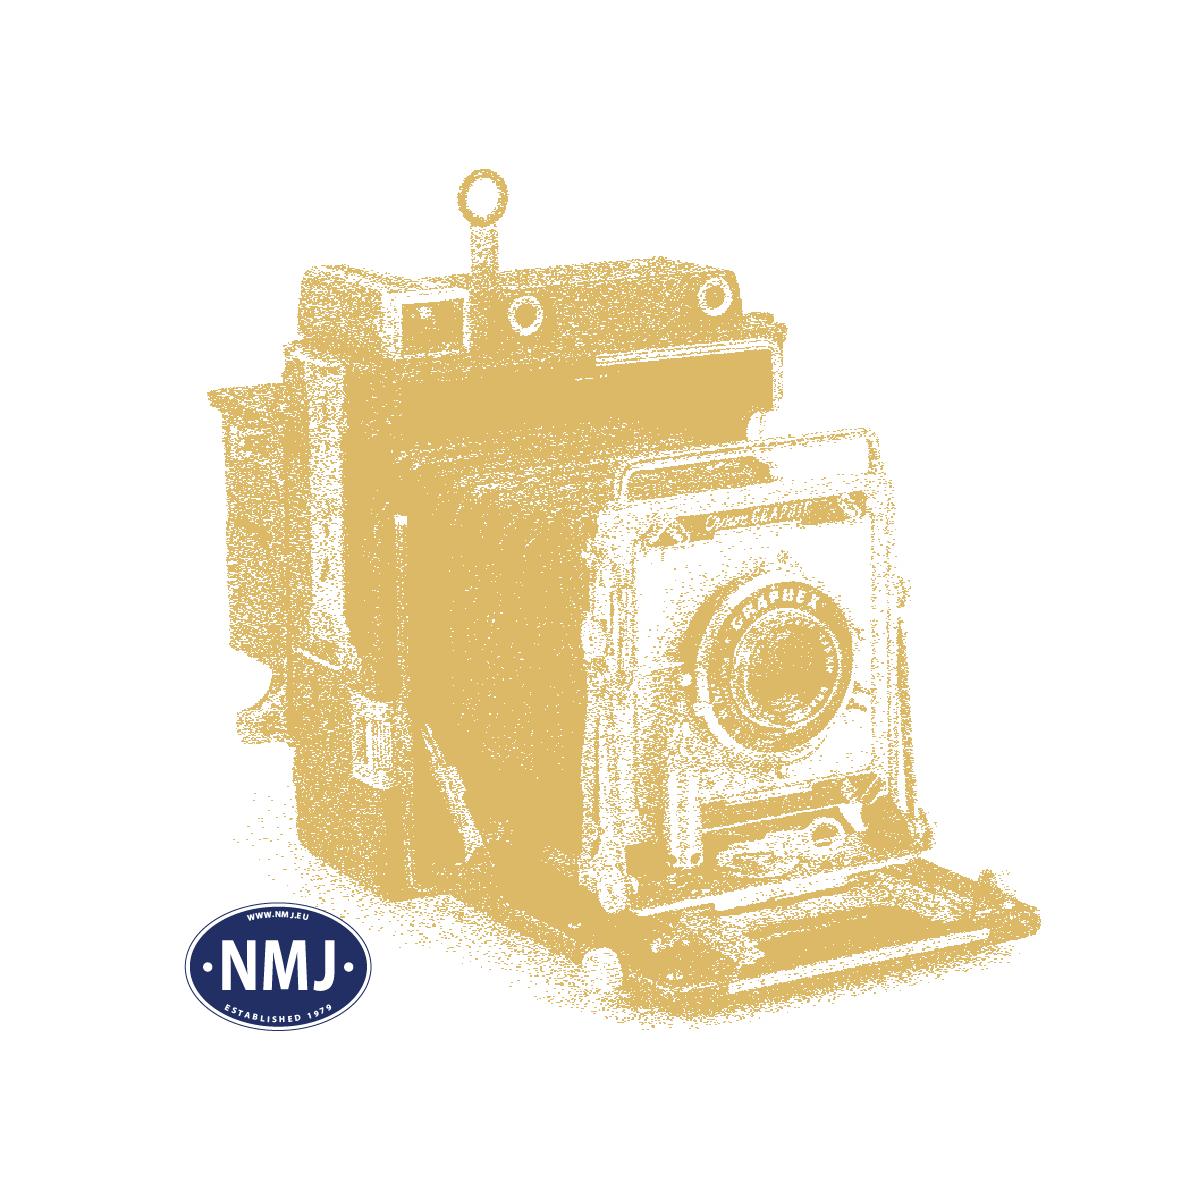 NMJT82.601 - NMJ Topline NSB El13.2156, Rød/Sort, DC